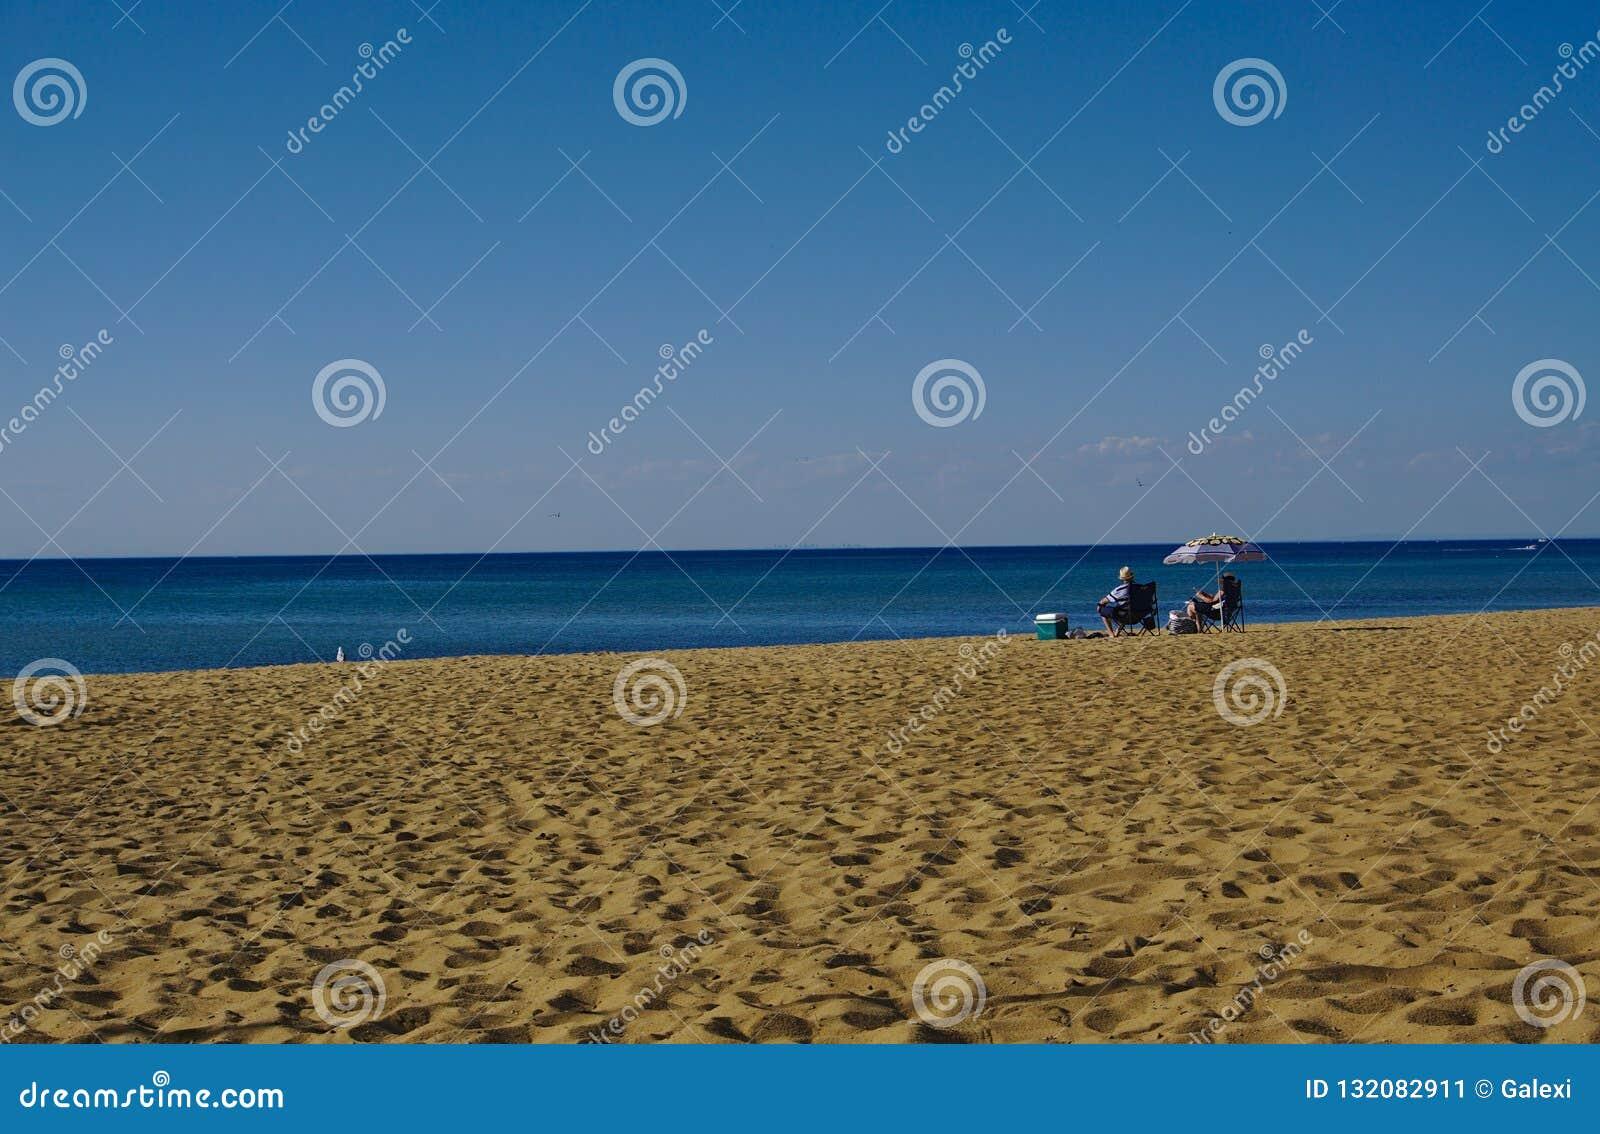 Two people enjoying sea on sunny day